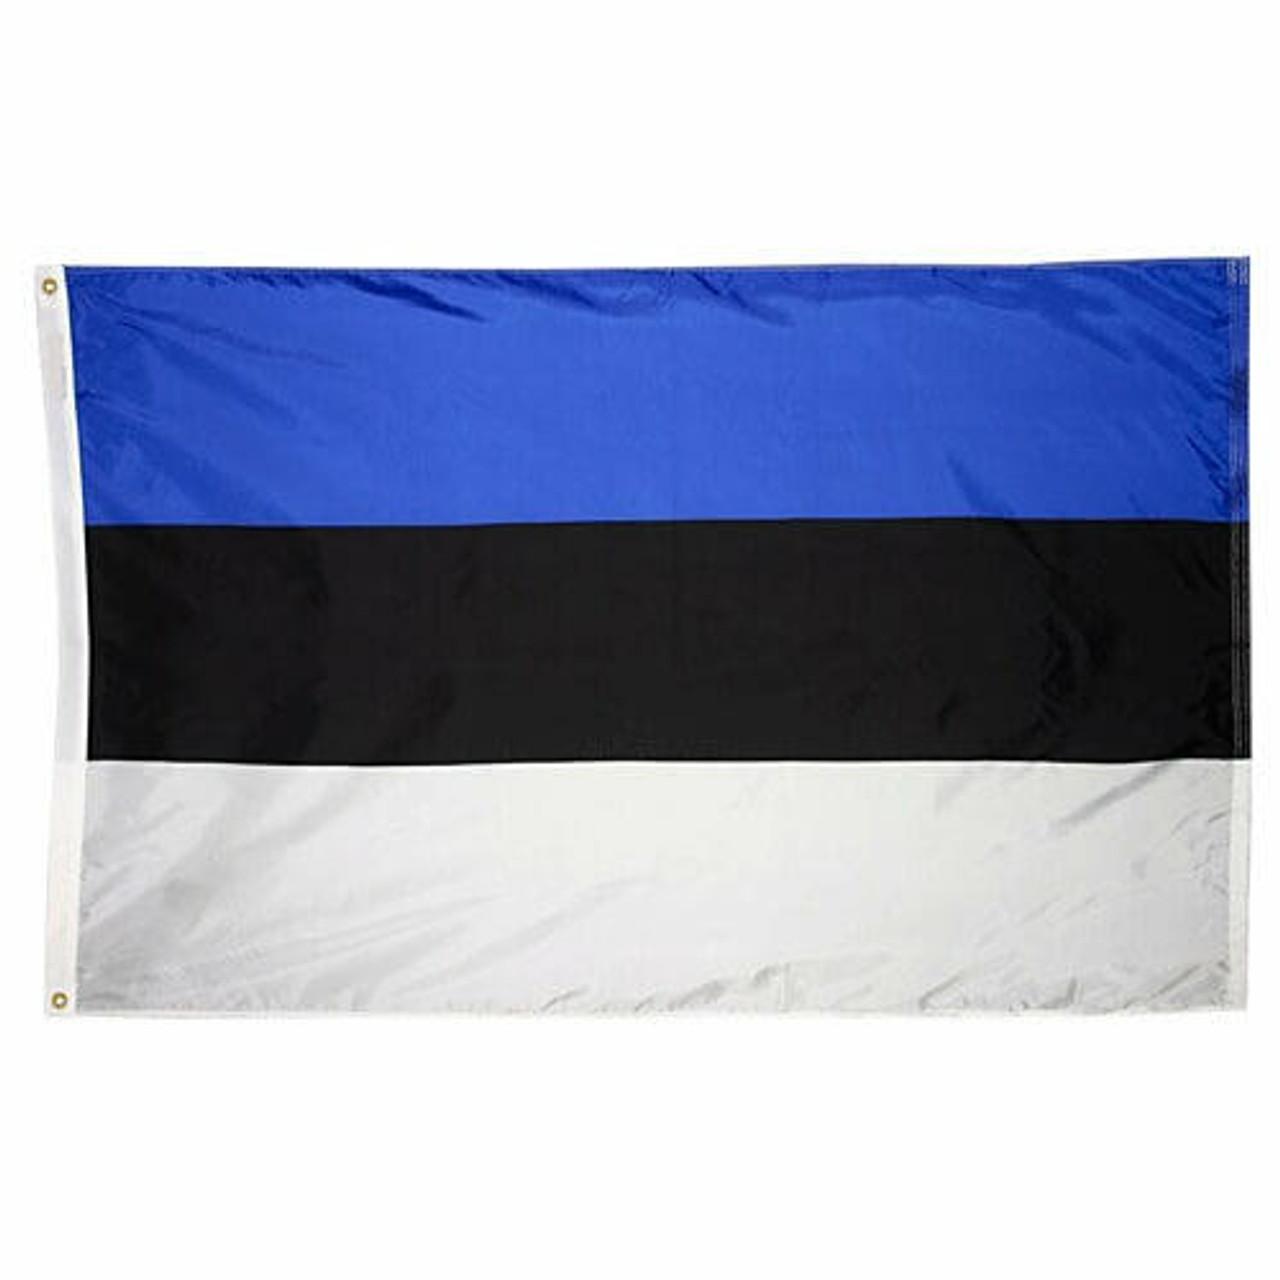 The Estonia Flag